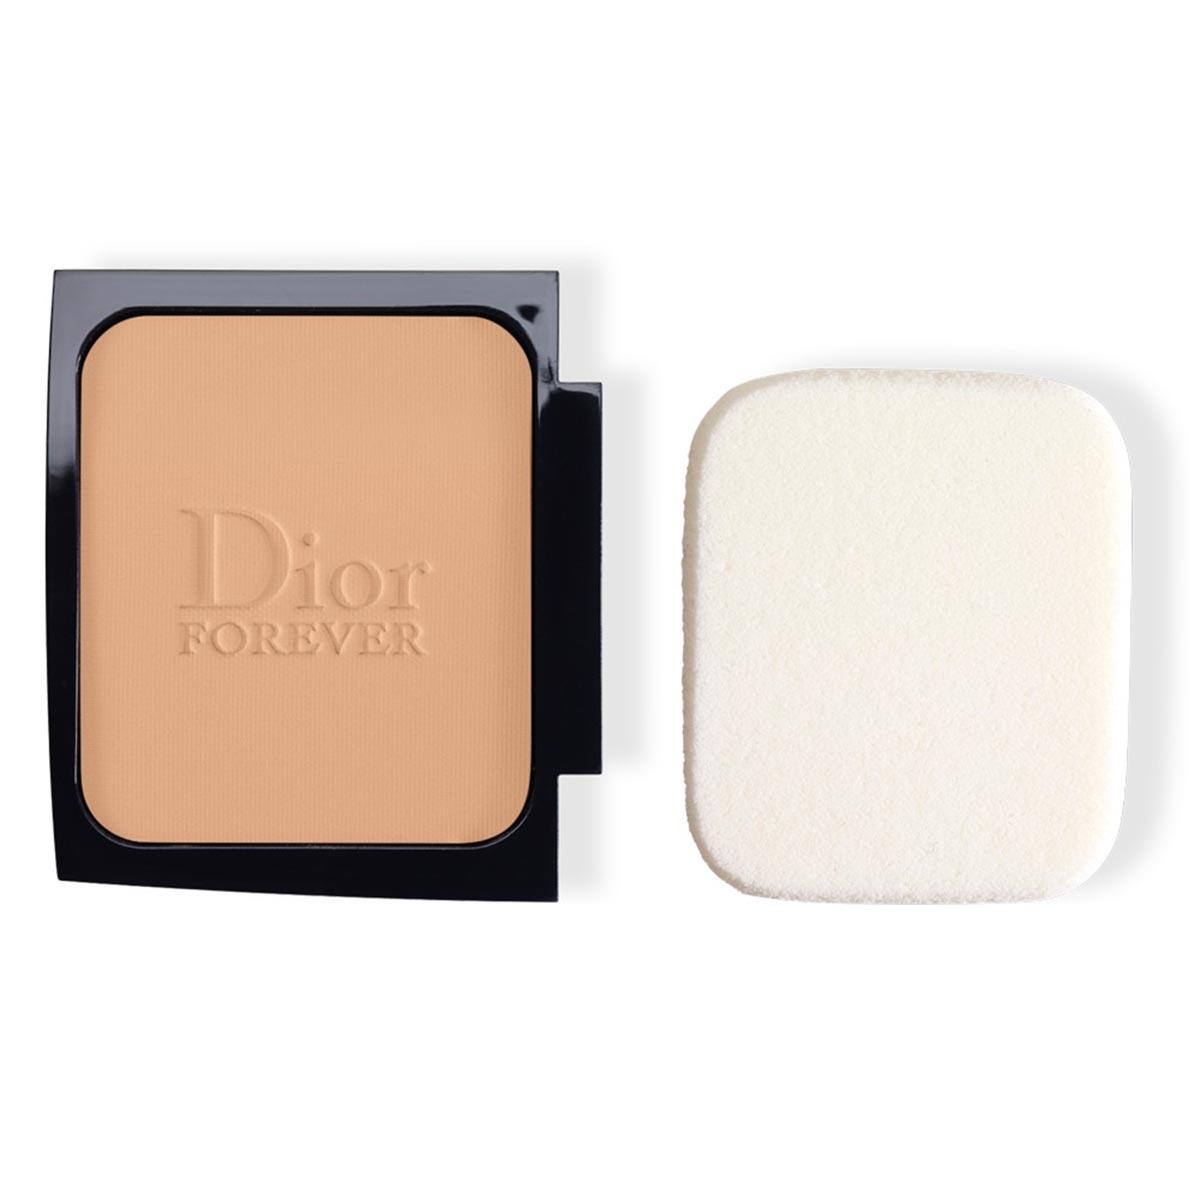 Dior diorskin forever compact powder refill 030